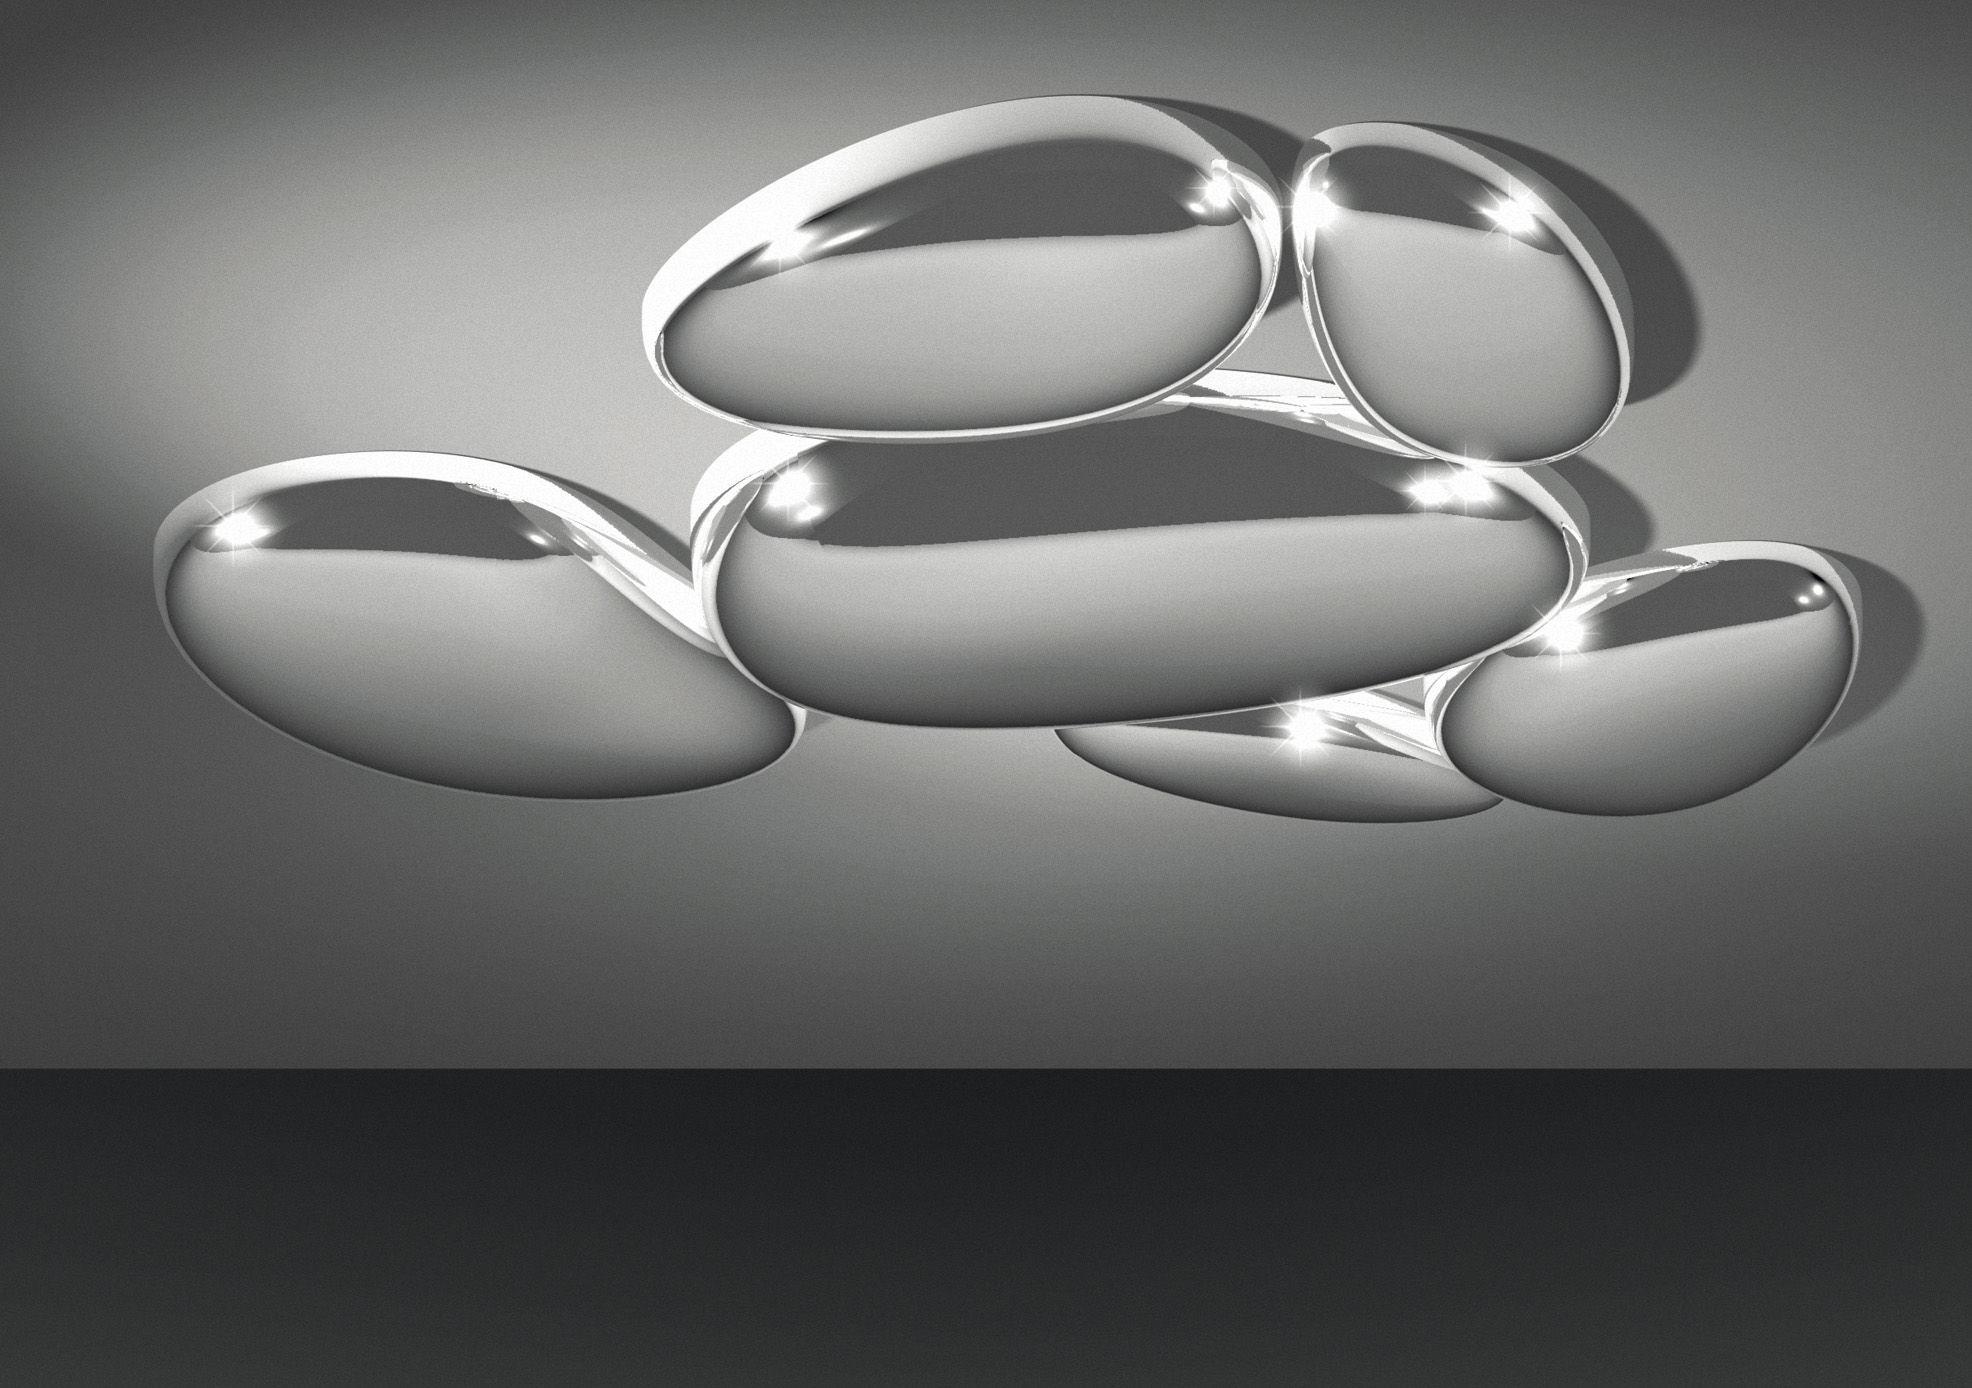 Skydro modell ohne leuchtk rper artemide deckenleuchte for Plafoniere moderne